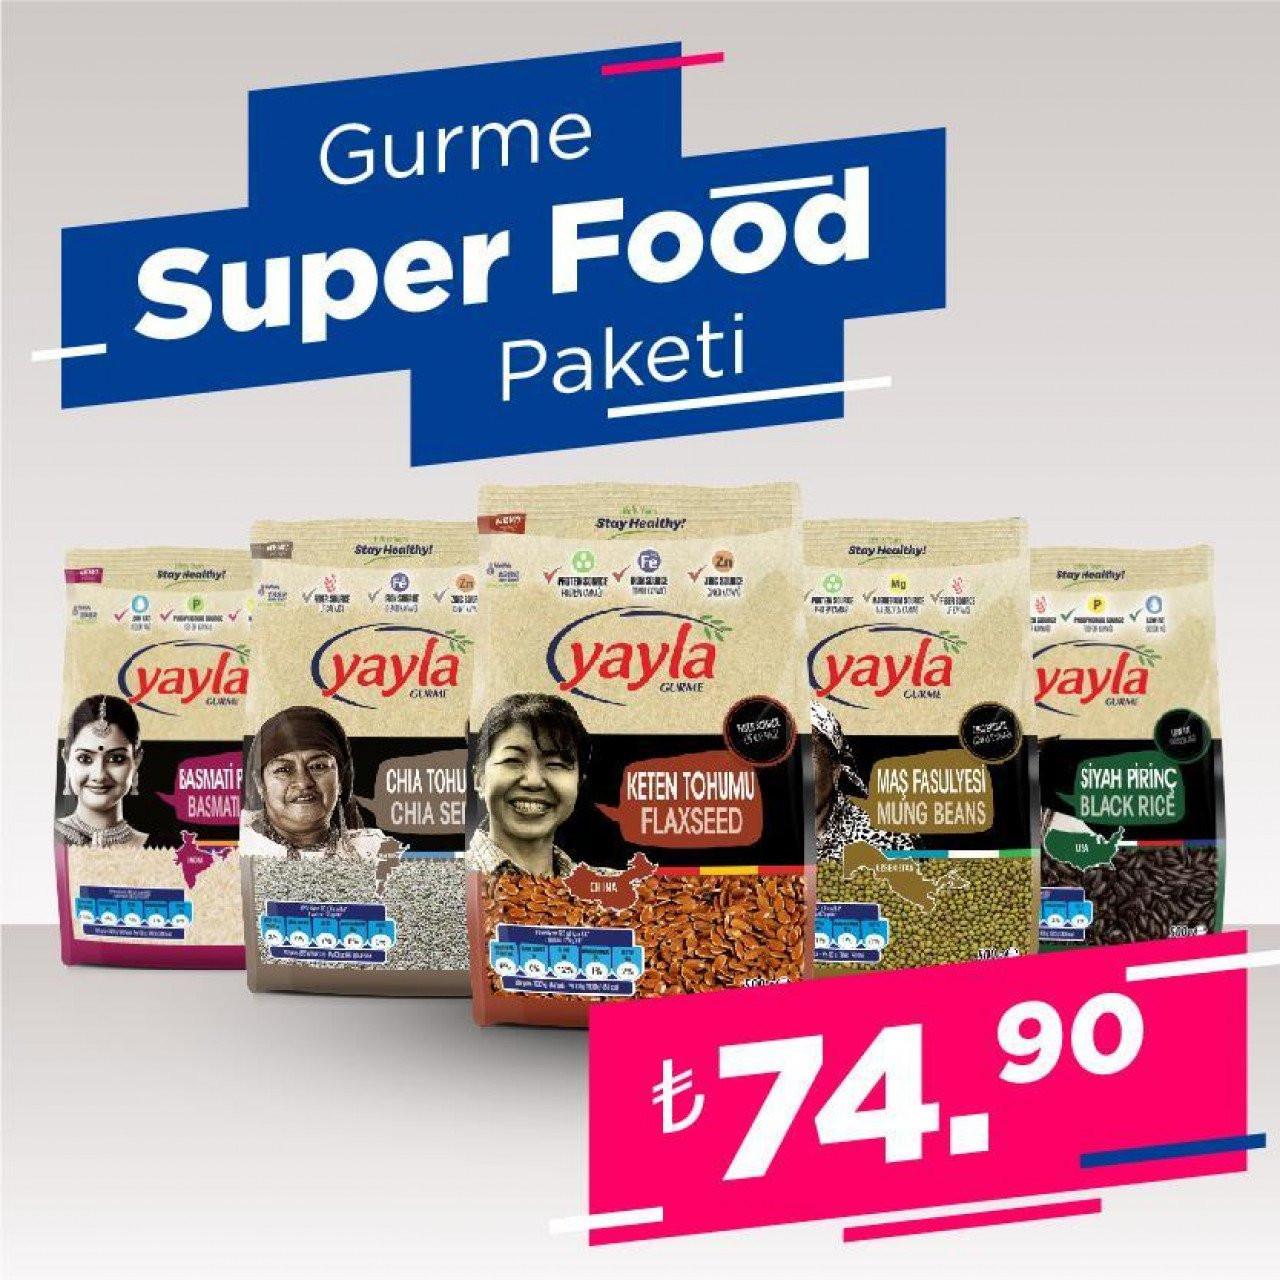 Gurme Super Food